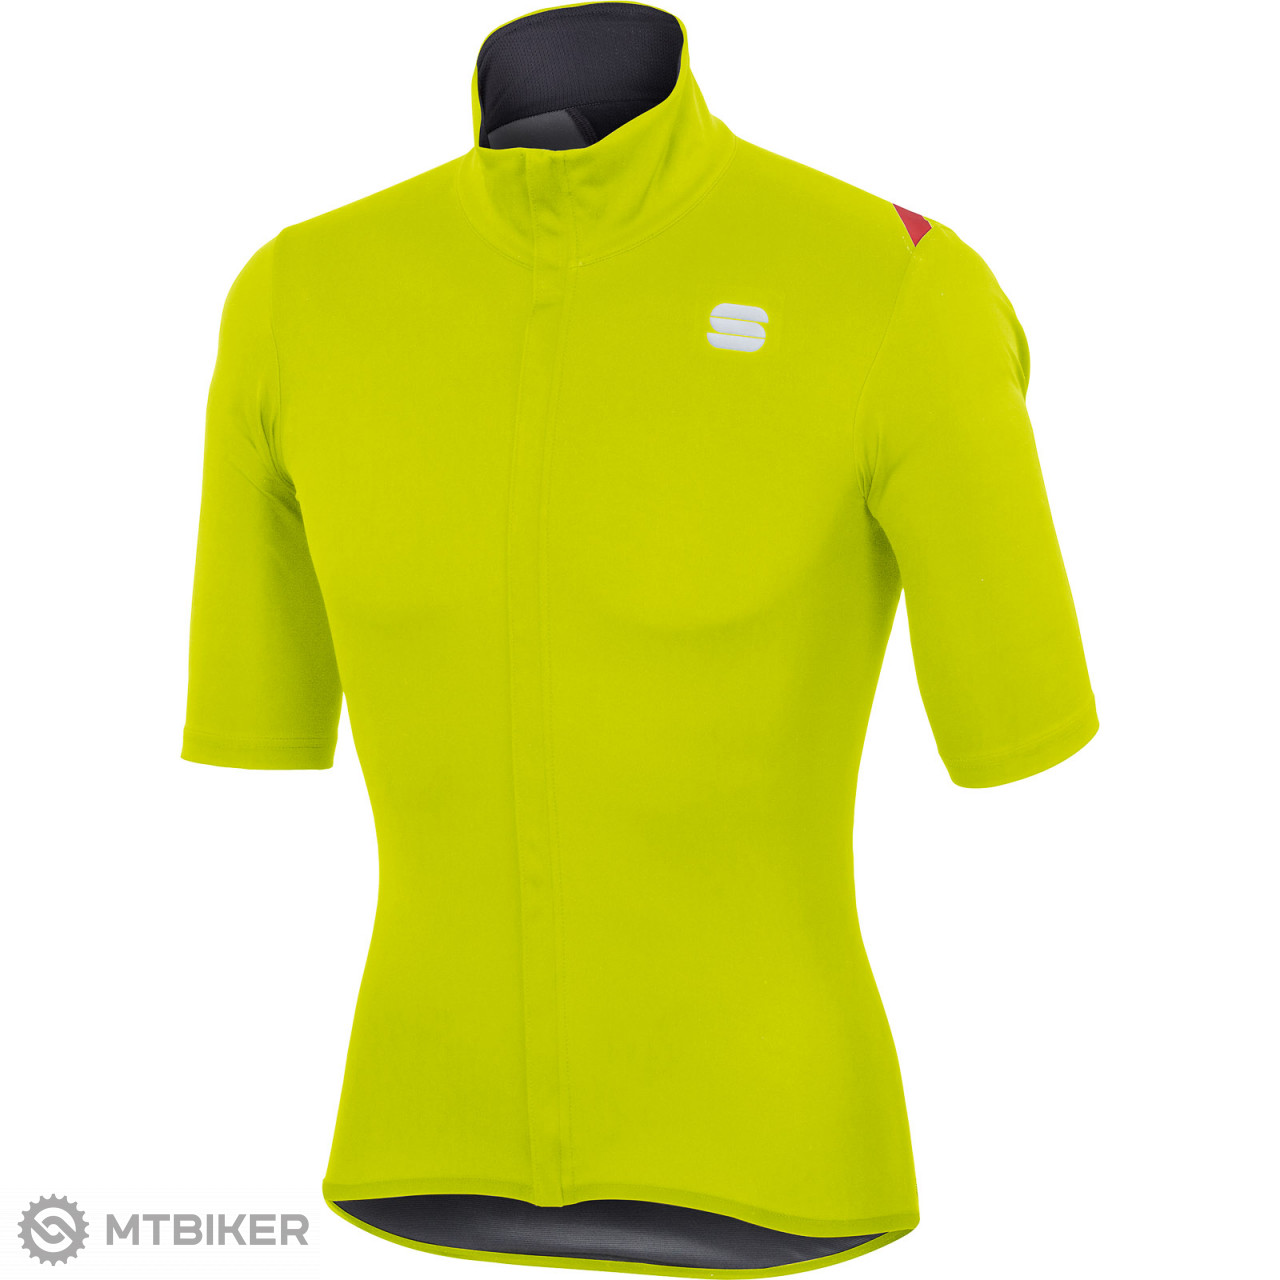 a9790425c78b Sportful Fiandre Light NoRain dres krátky rukáv fluo žltý - MTBIKER Shop